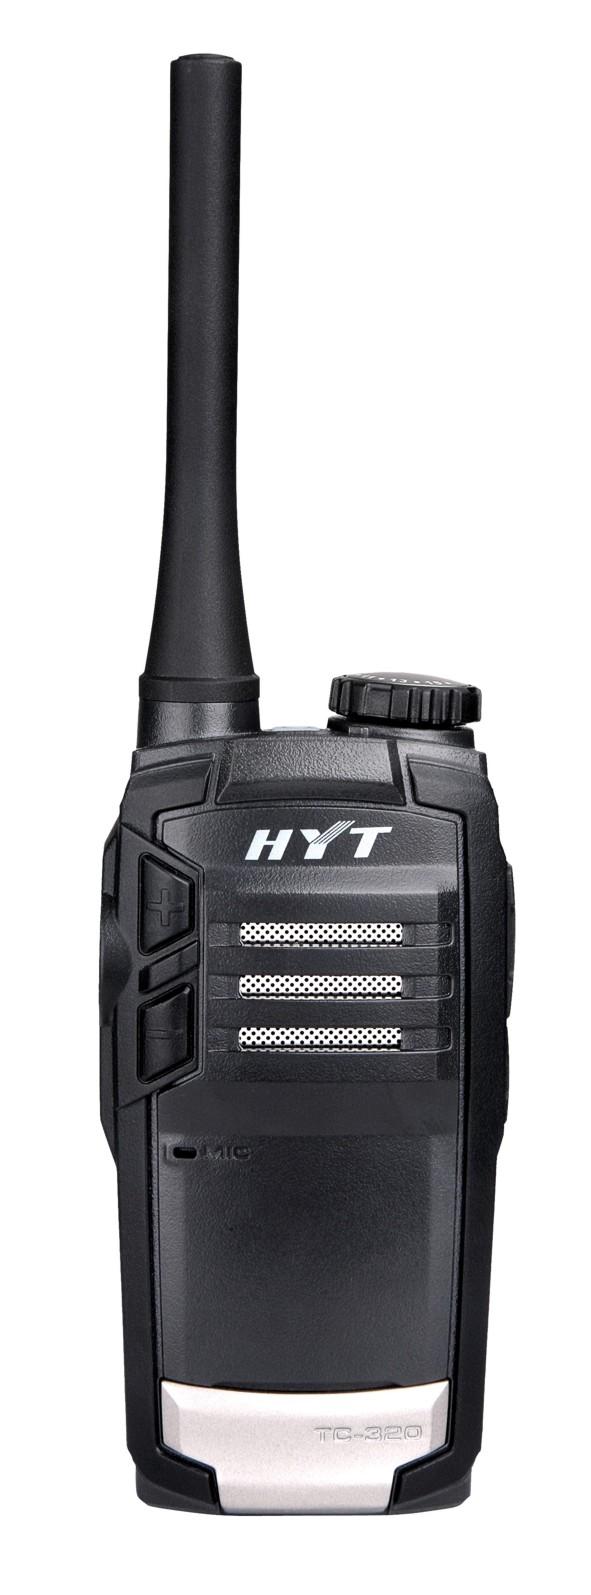 HYT TC 320